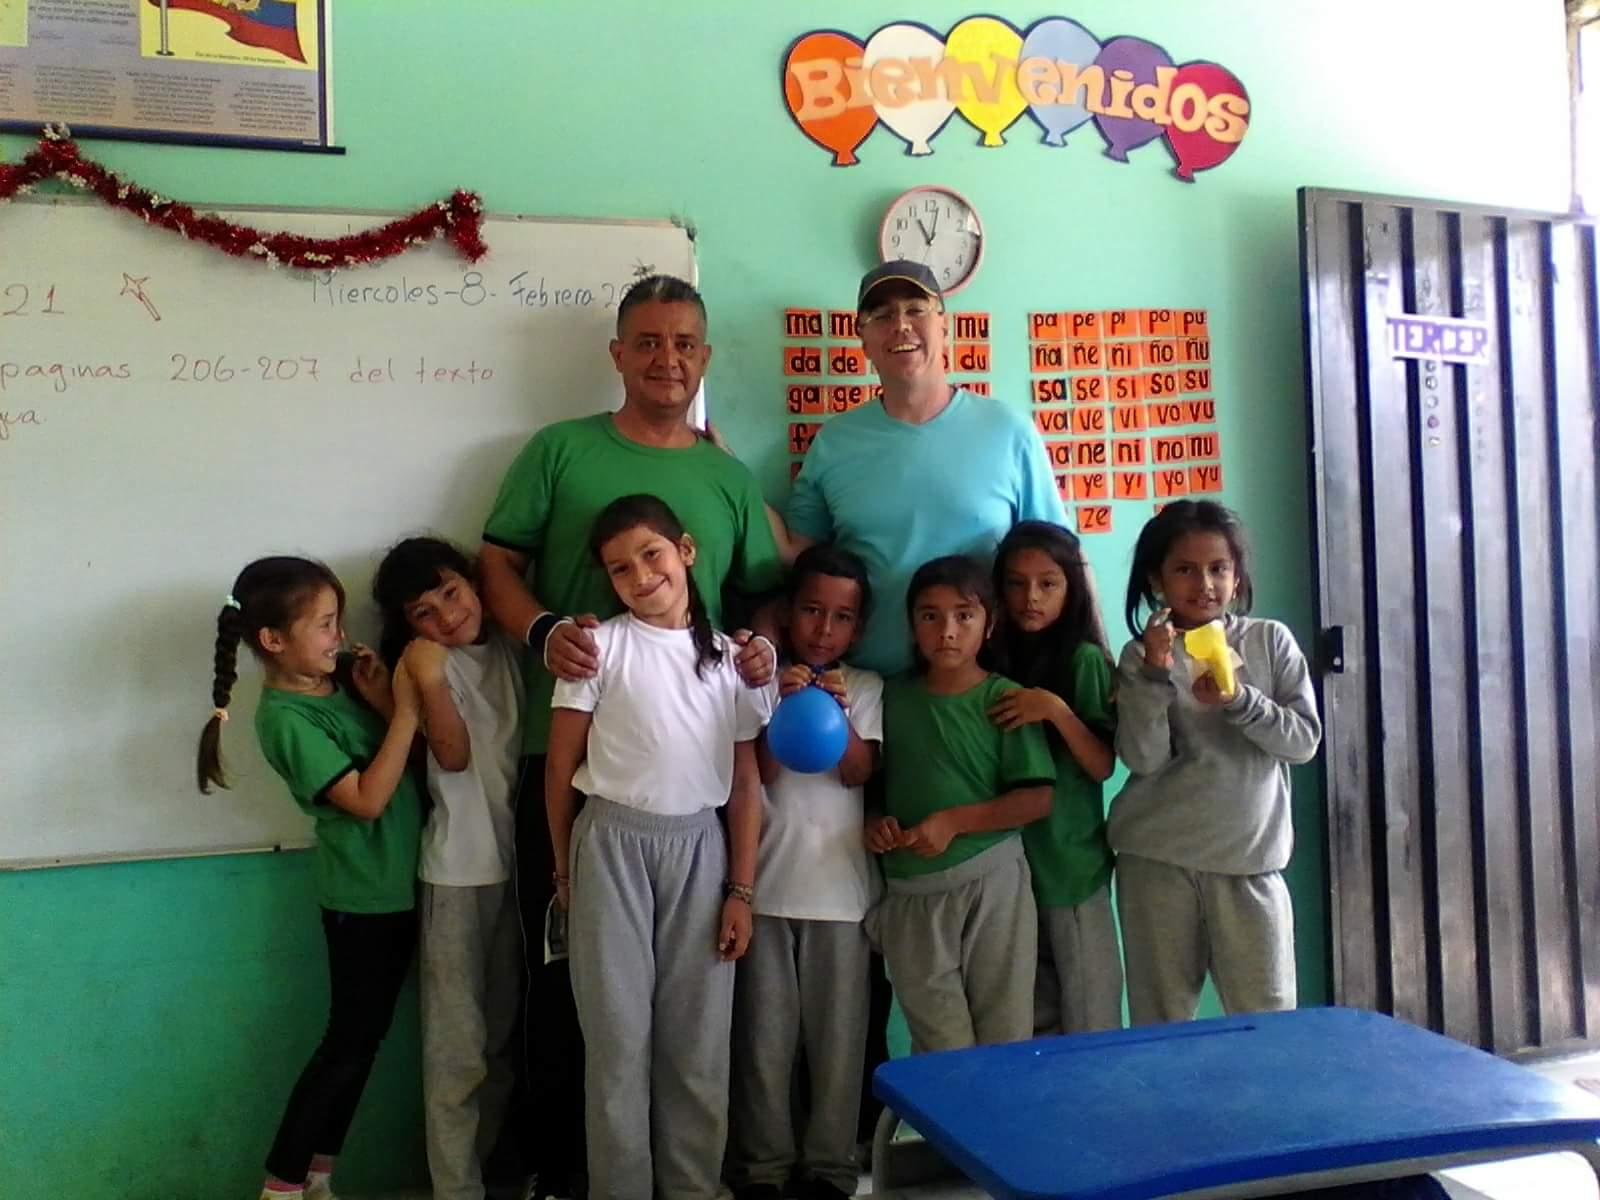 Some 2nd-graders and their teacher Samir.